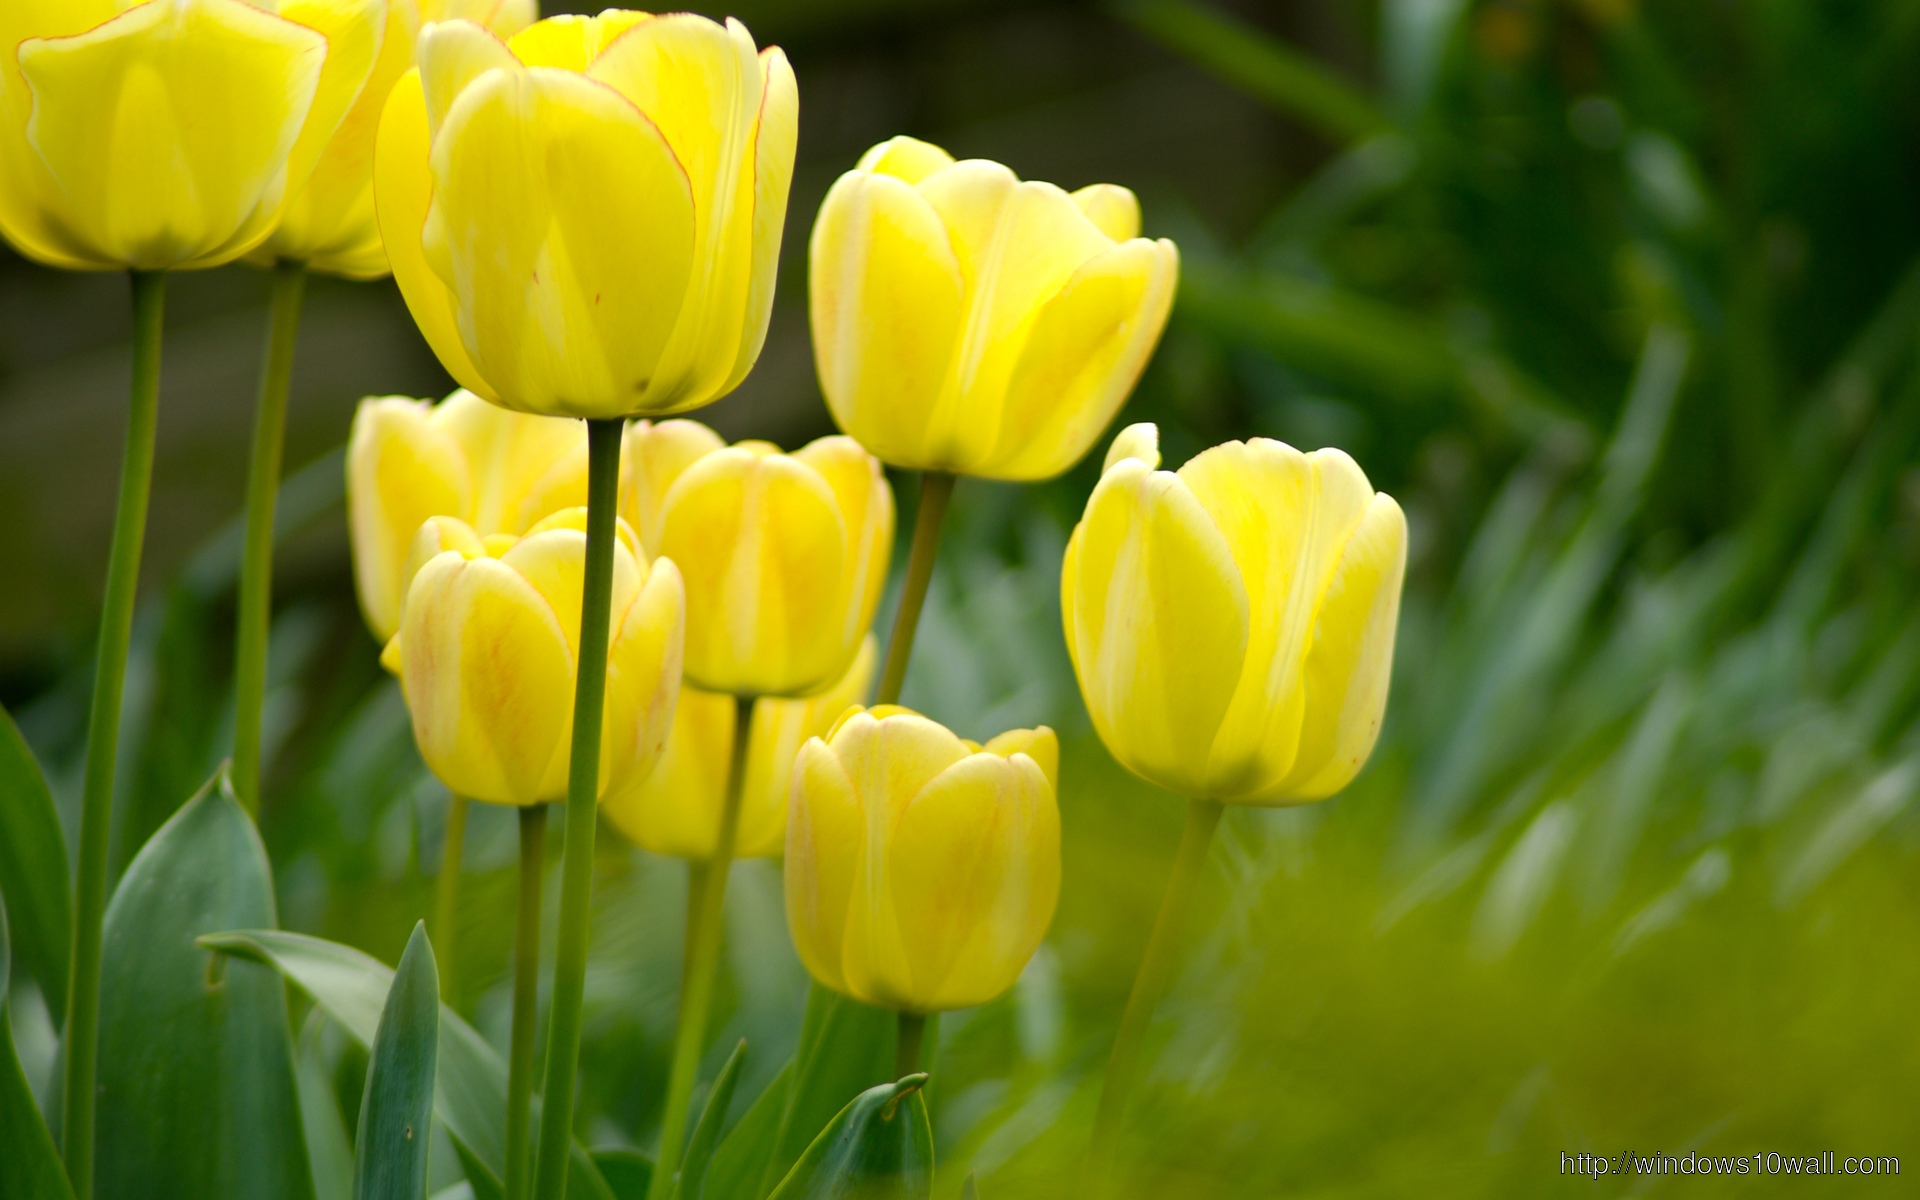 Tulip Flower Wallpaper free download - windows 10 Wallpapers